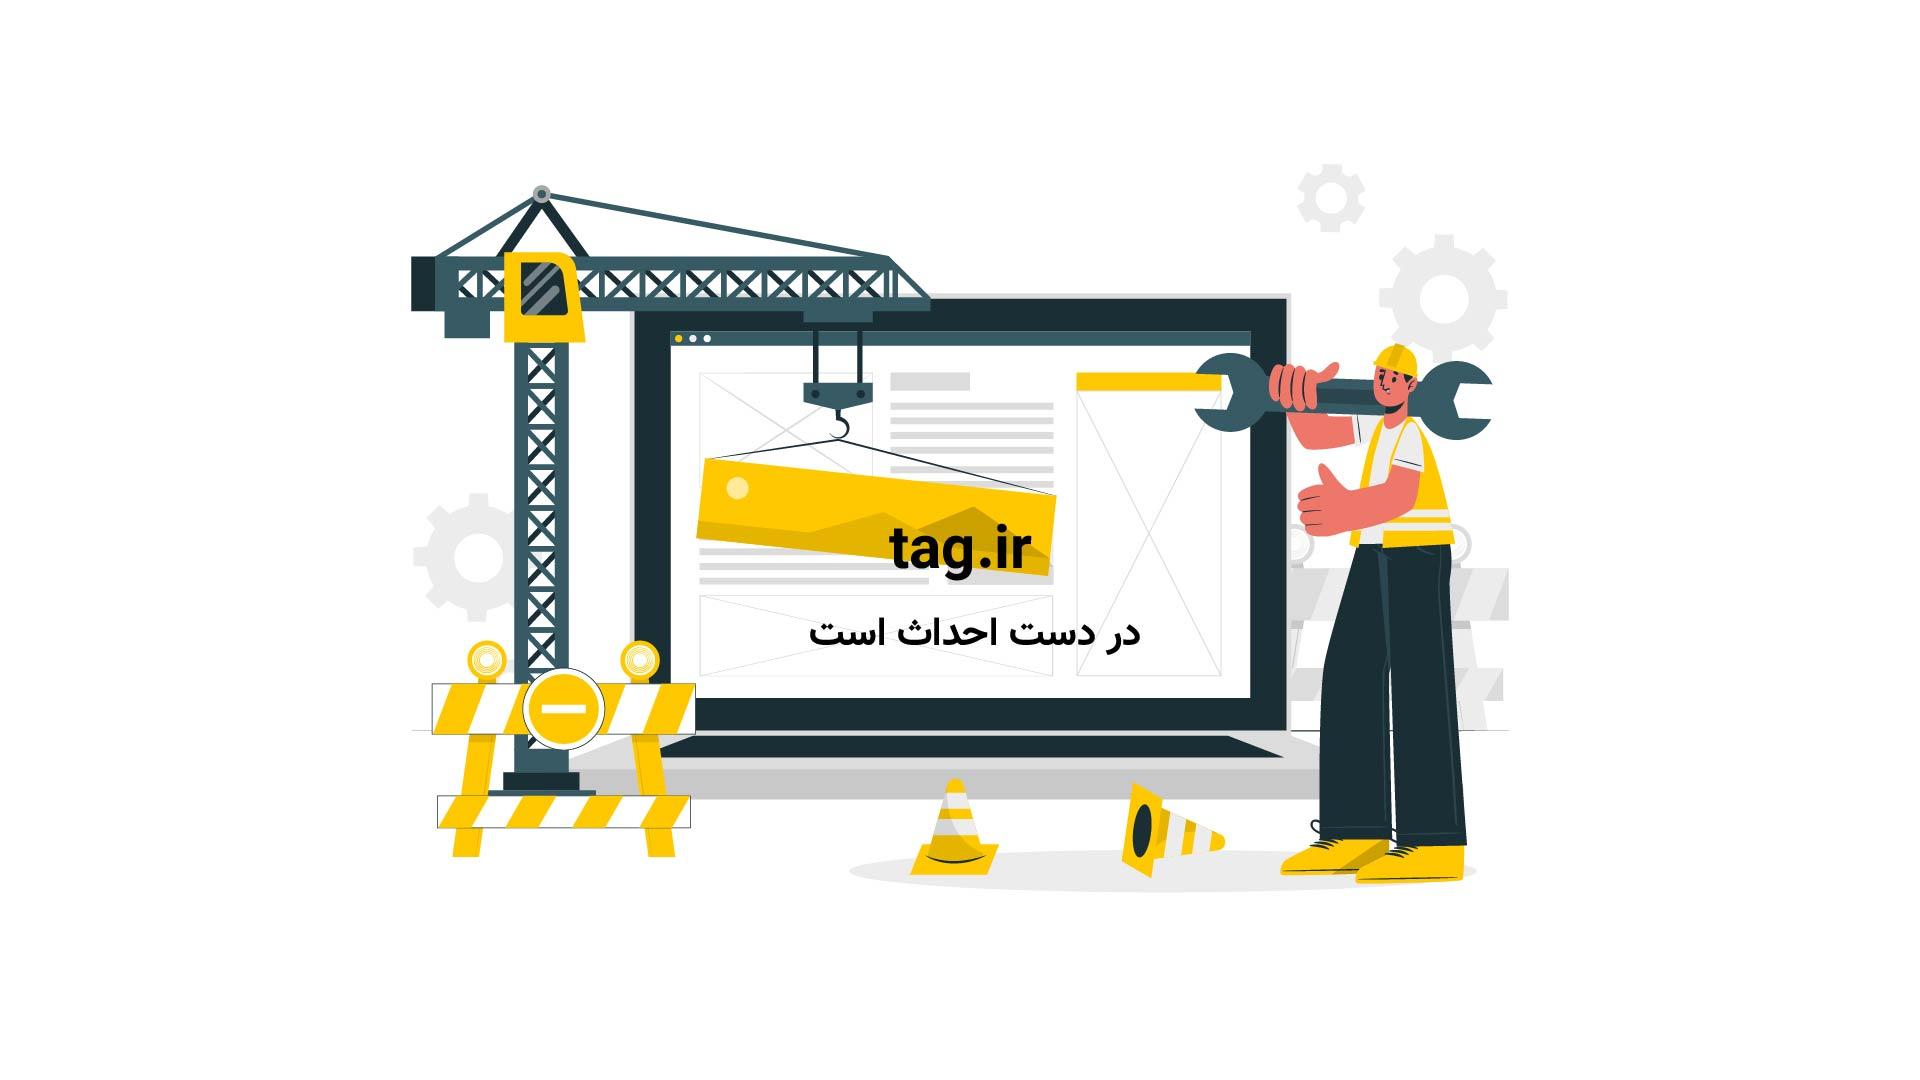 شکار-عقاب | تگ